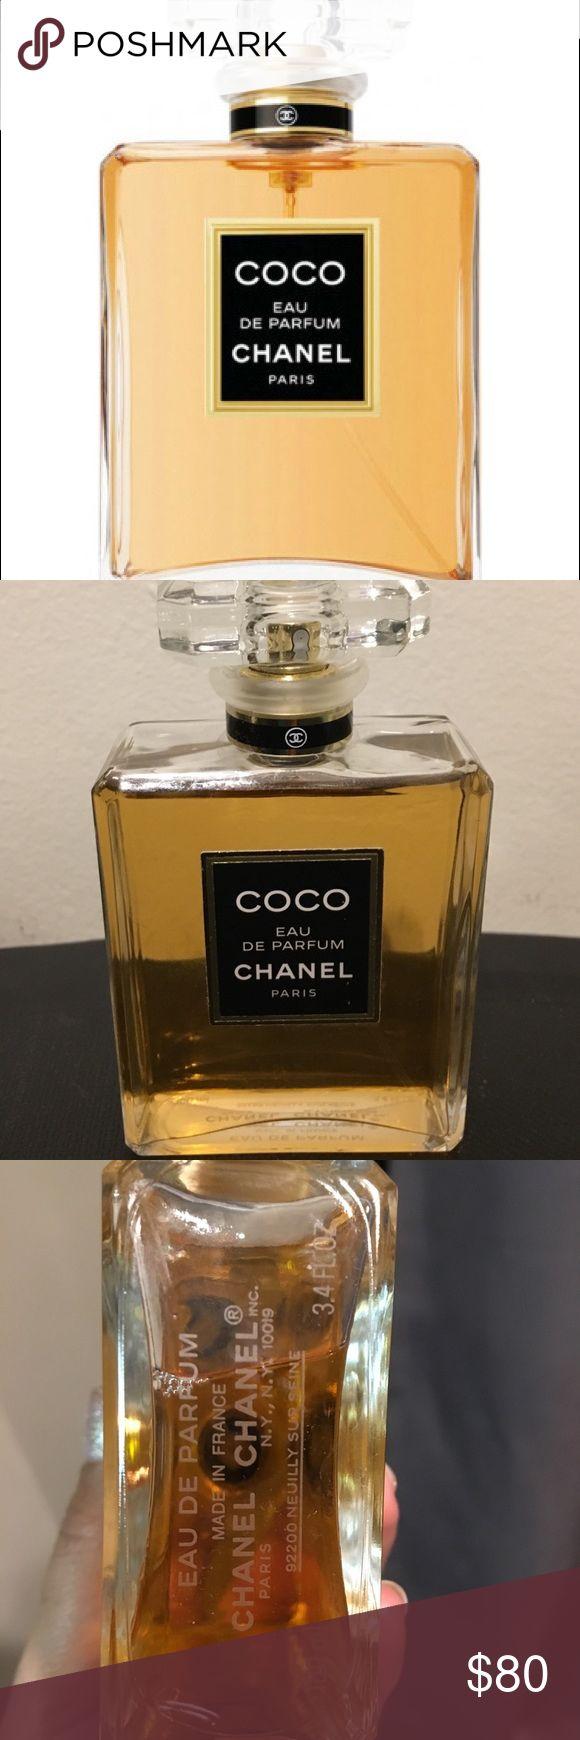 🔥 NEW Coco Chanel eau de parfum 3.4oz Only sprayed a few times brand new. 3.4 oz CHANEL Other